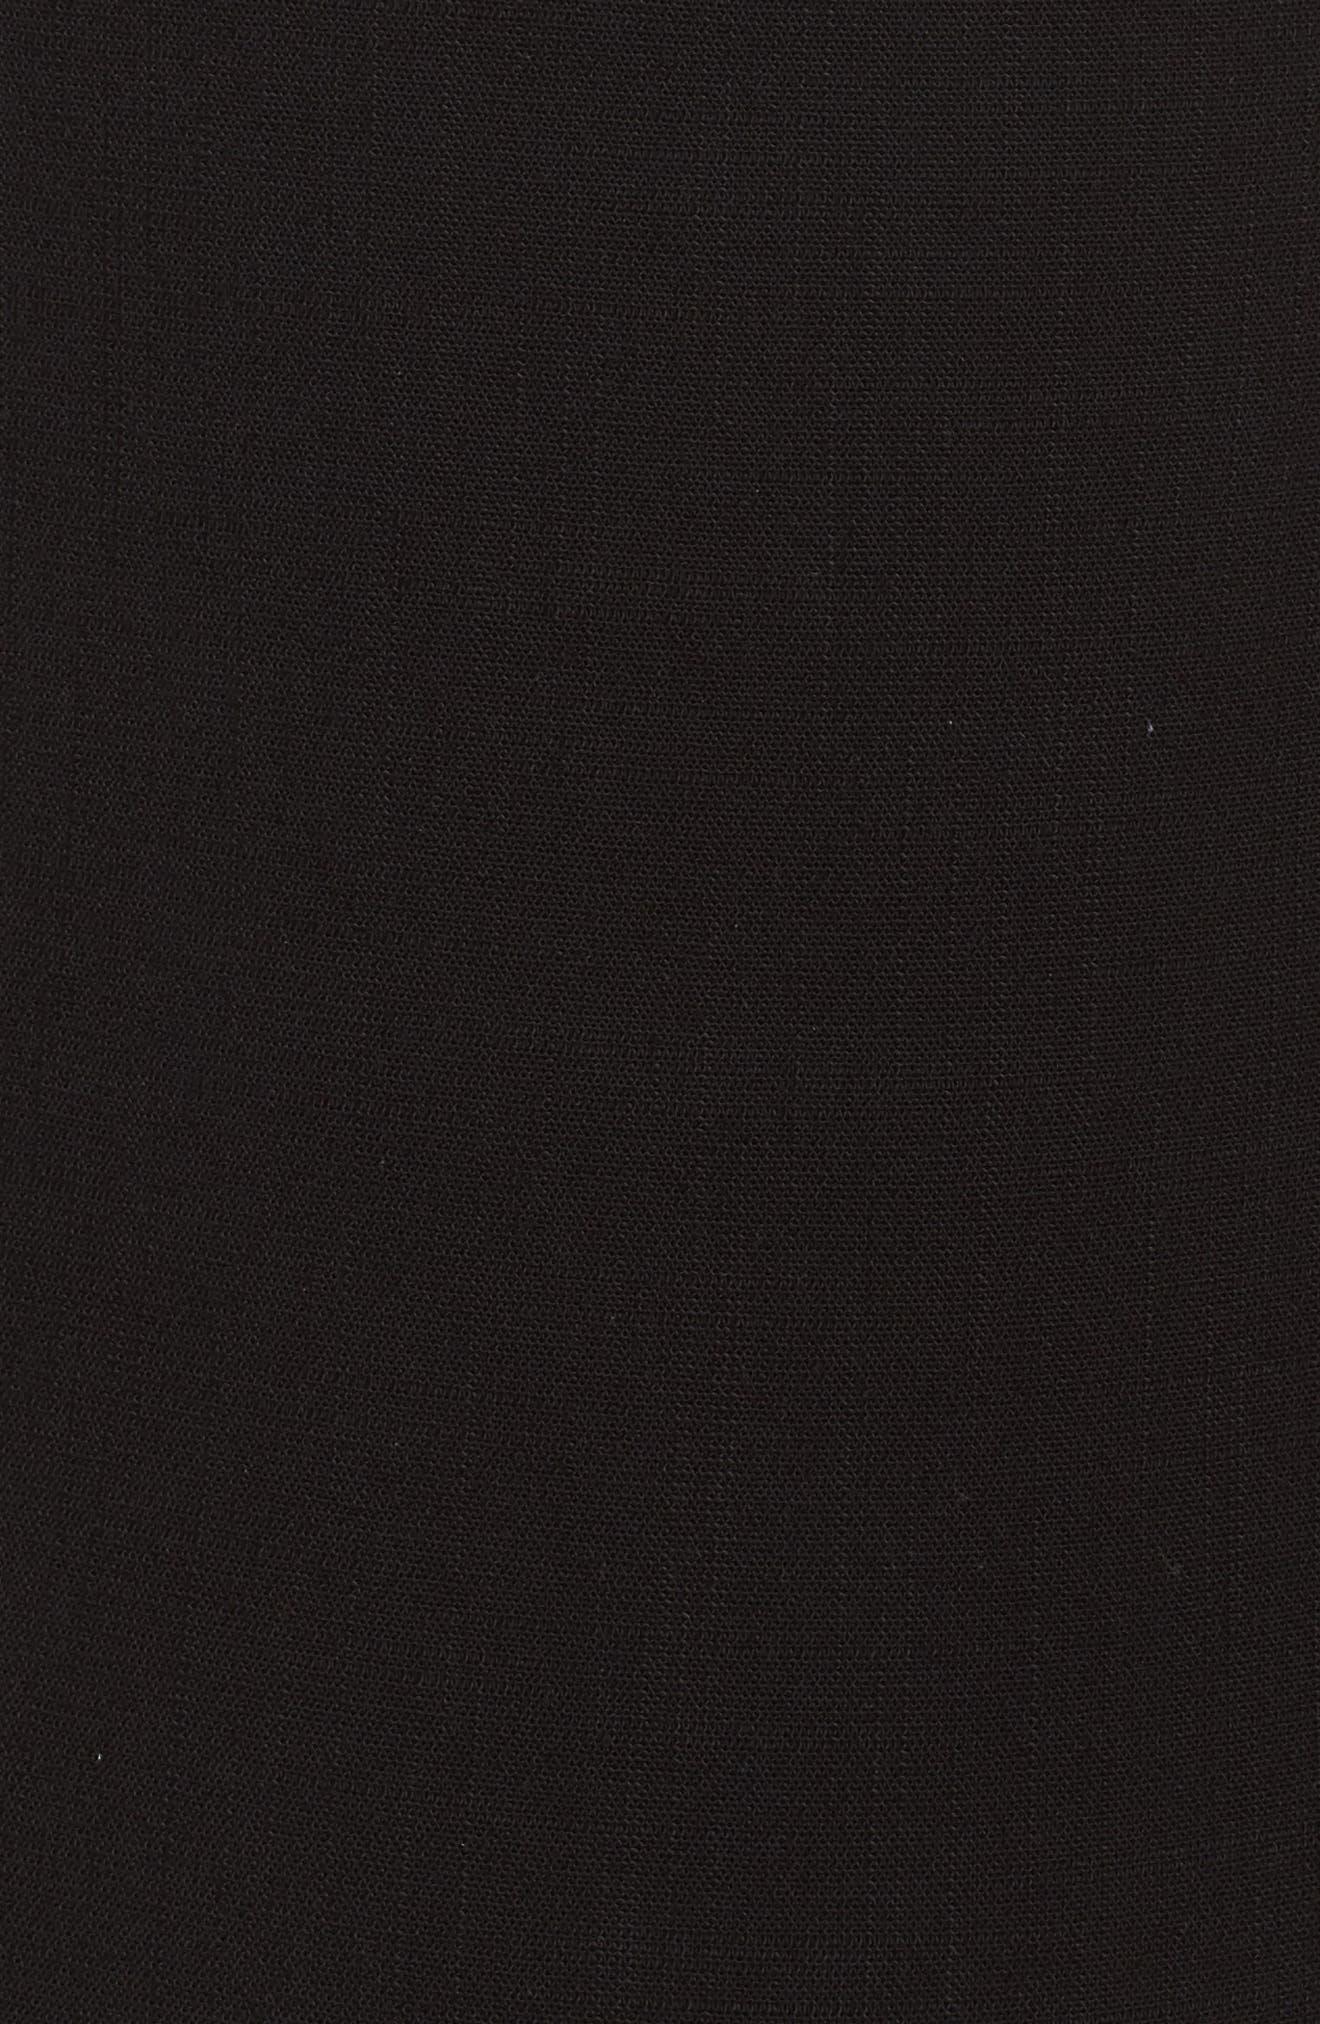 Pippa Thong Bodysuit,                             Alternate thumbnail 5, color,                             001